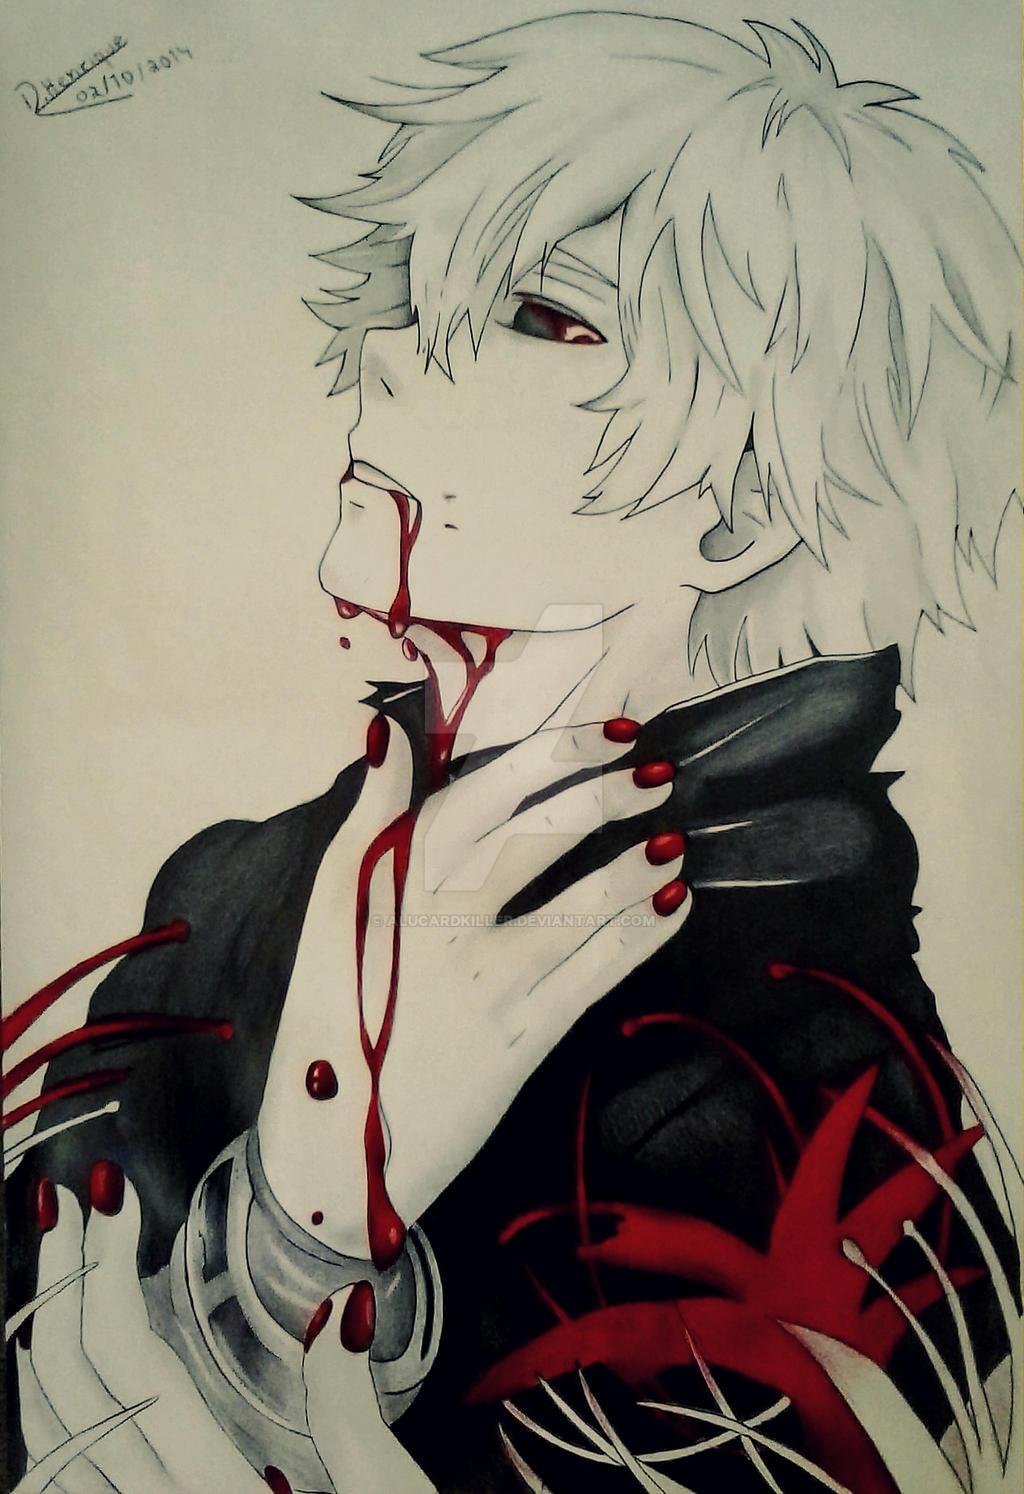 kaneki___tokyo_ghoul_by_alucardkiller-d8igybo.jpg